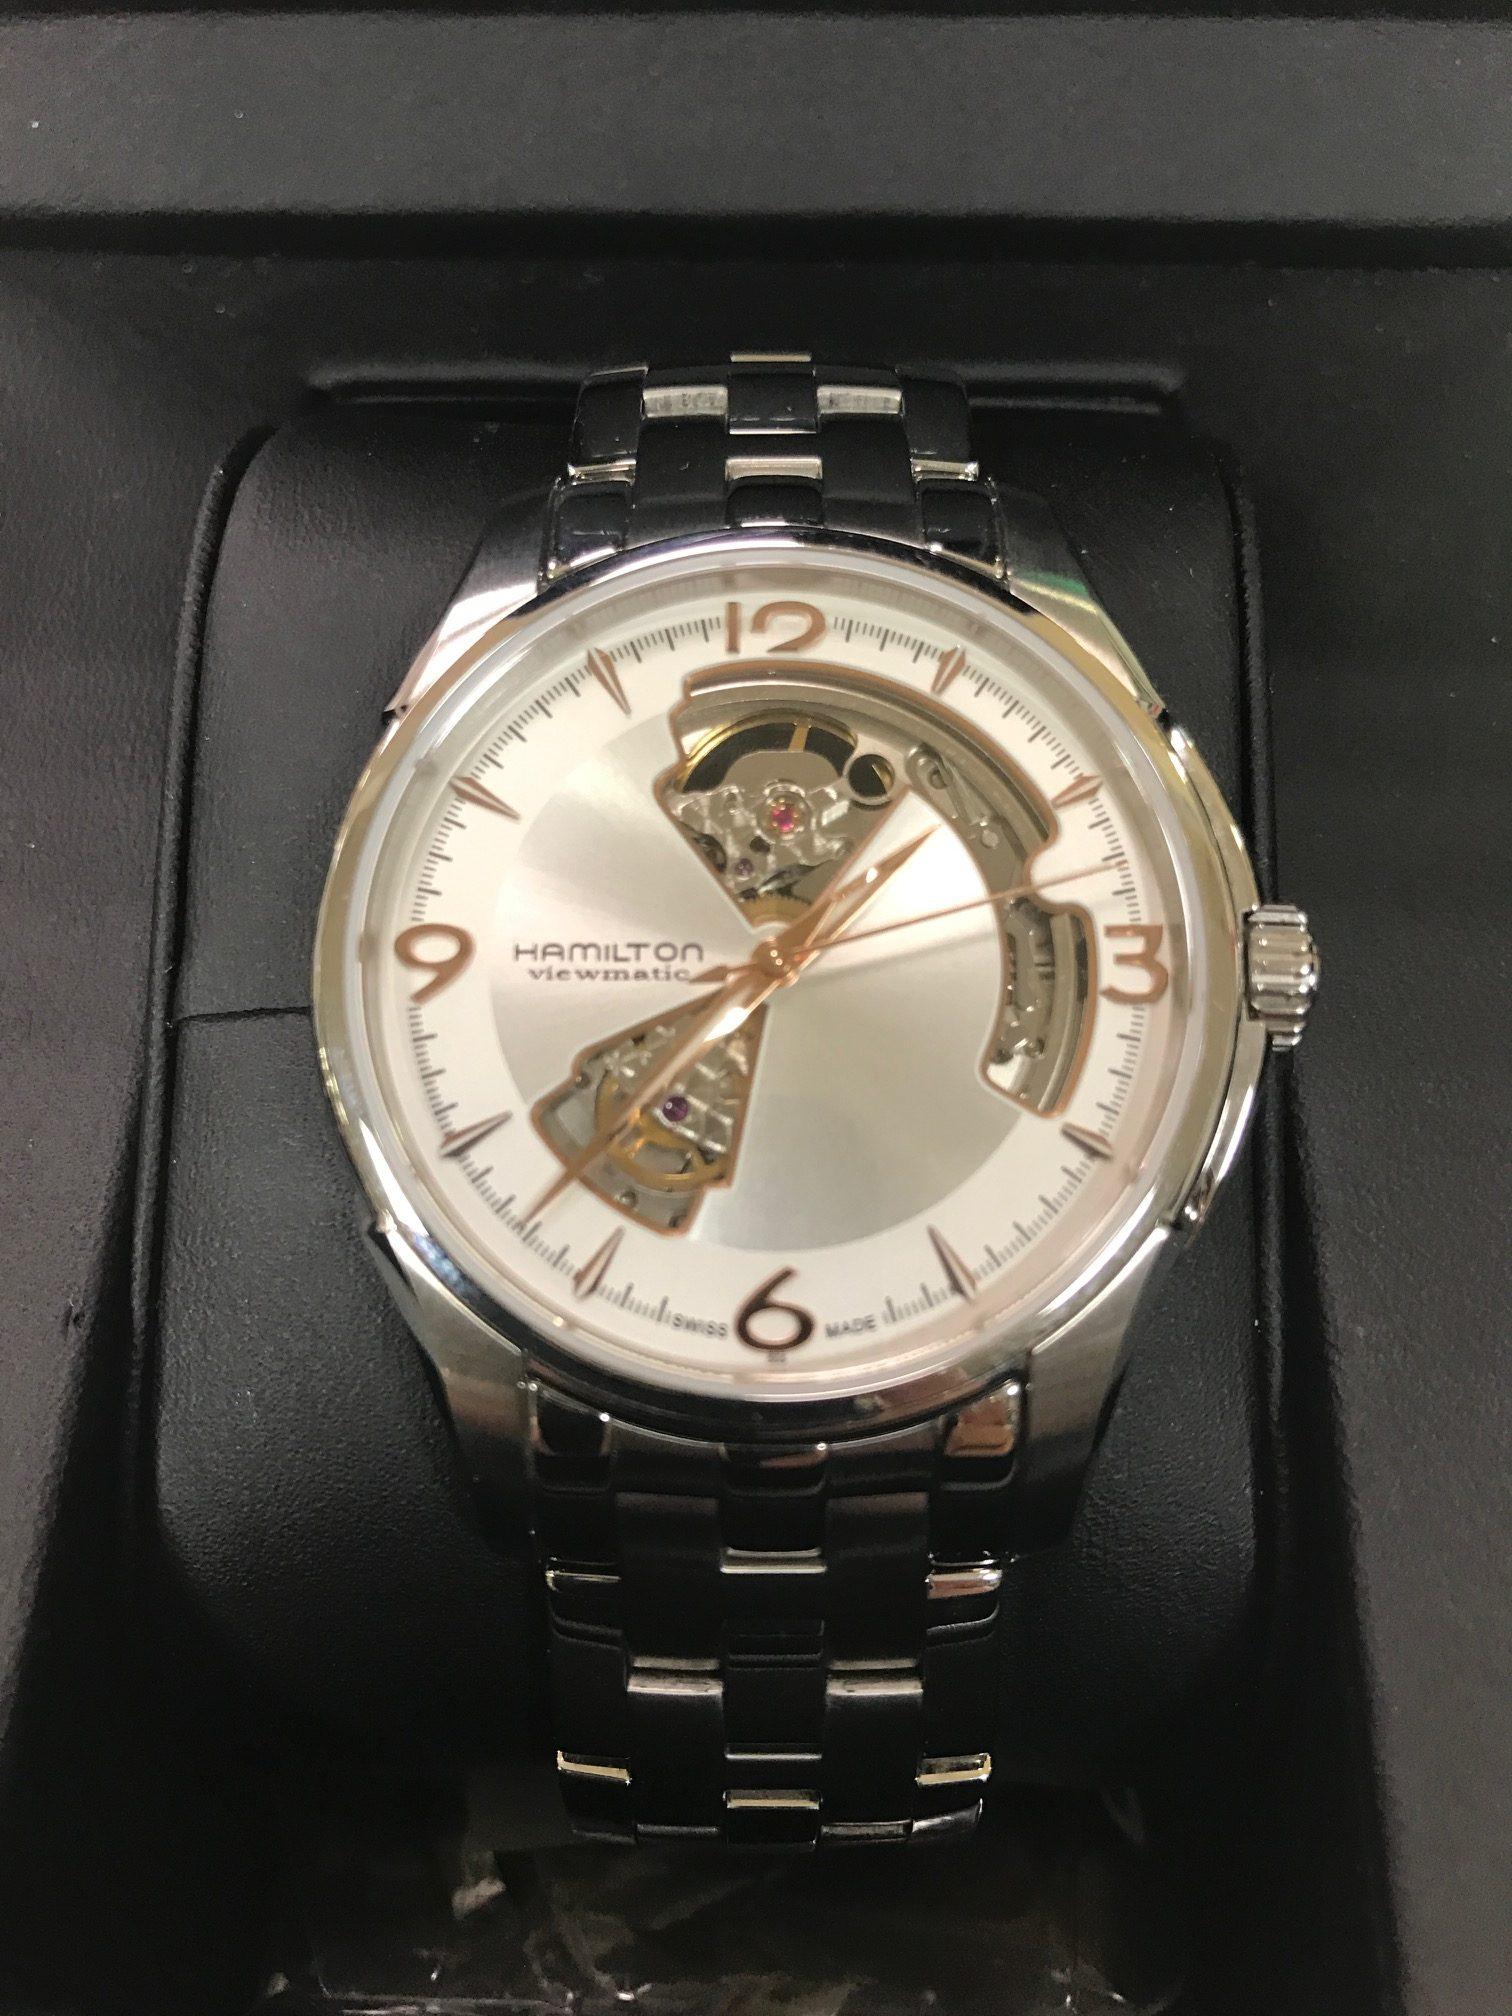 HAMILTON ハミルトン ジャズマスター 自動巻腕時計☆サンステッププラスワッセ店 買取 買い取り 福井市